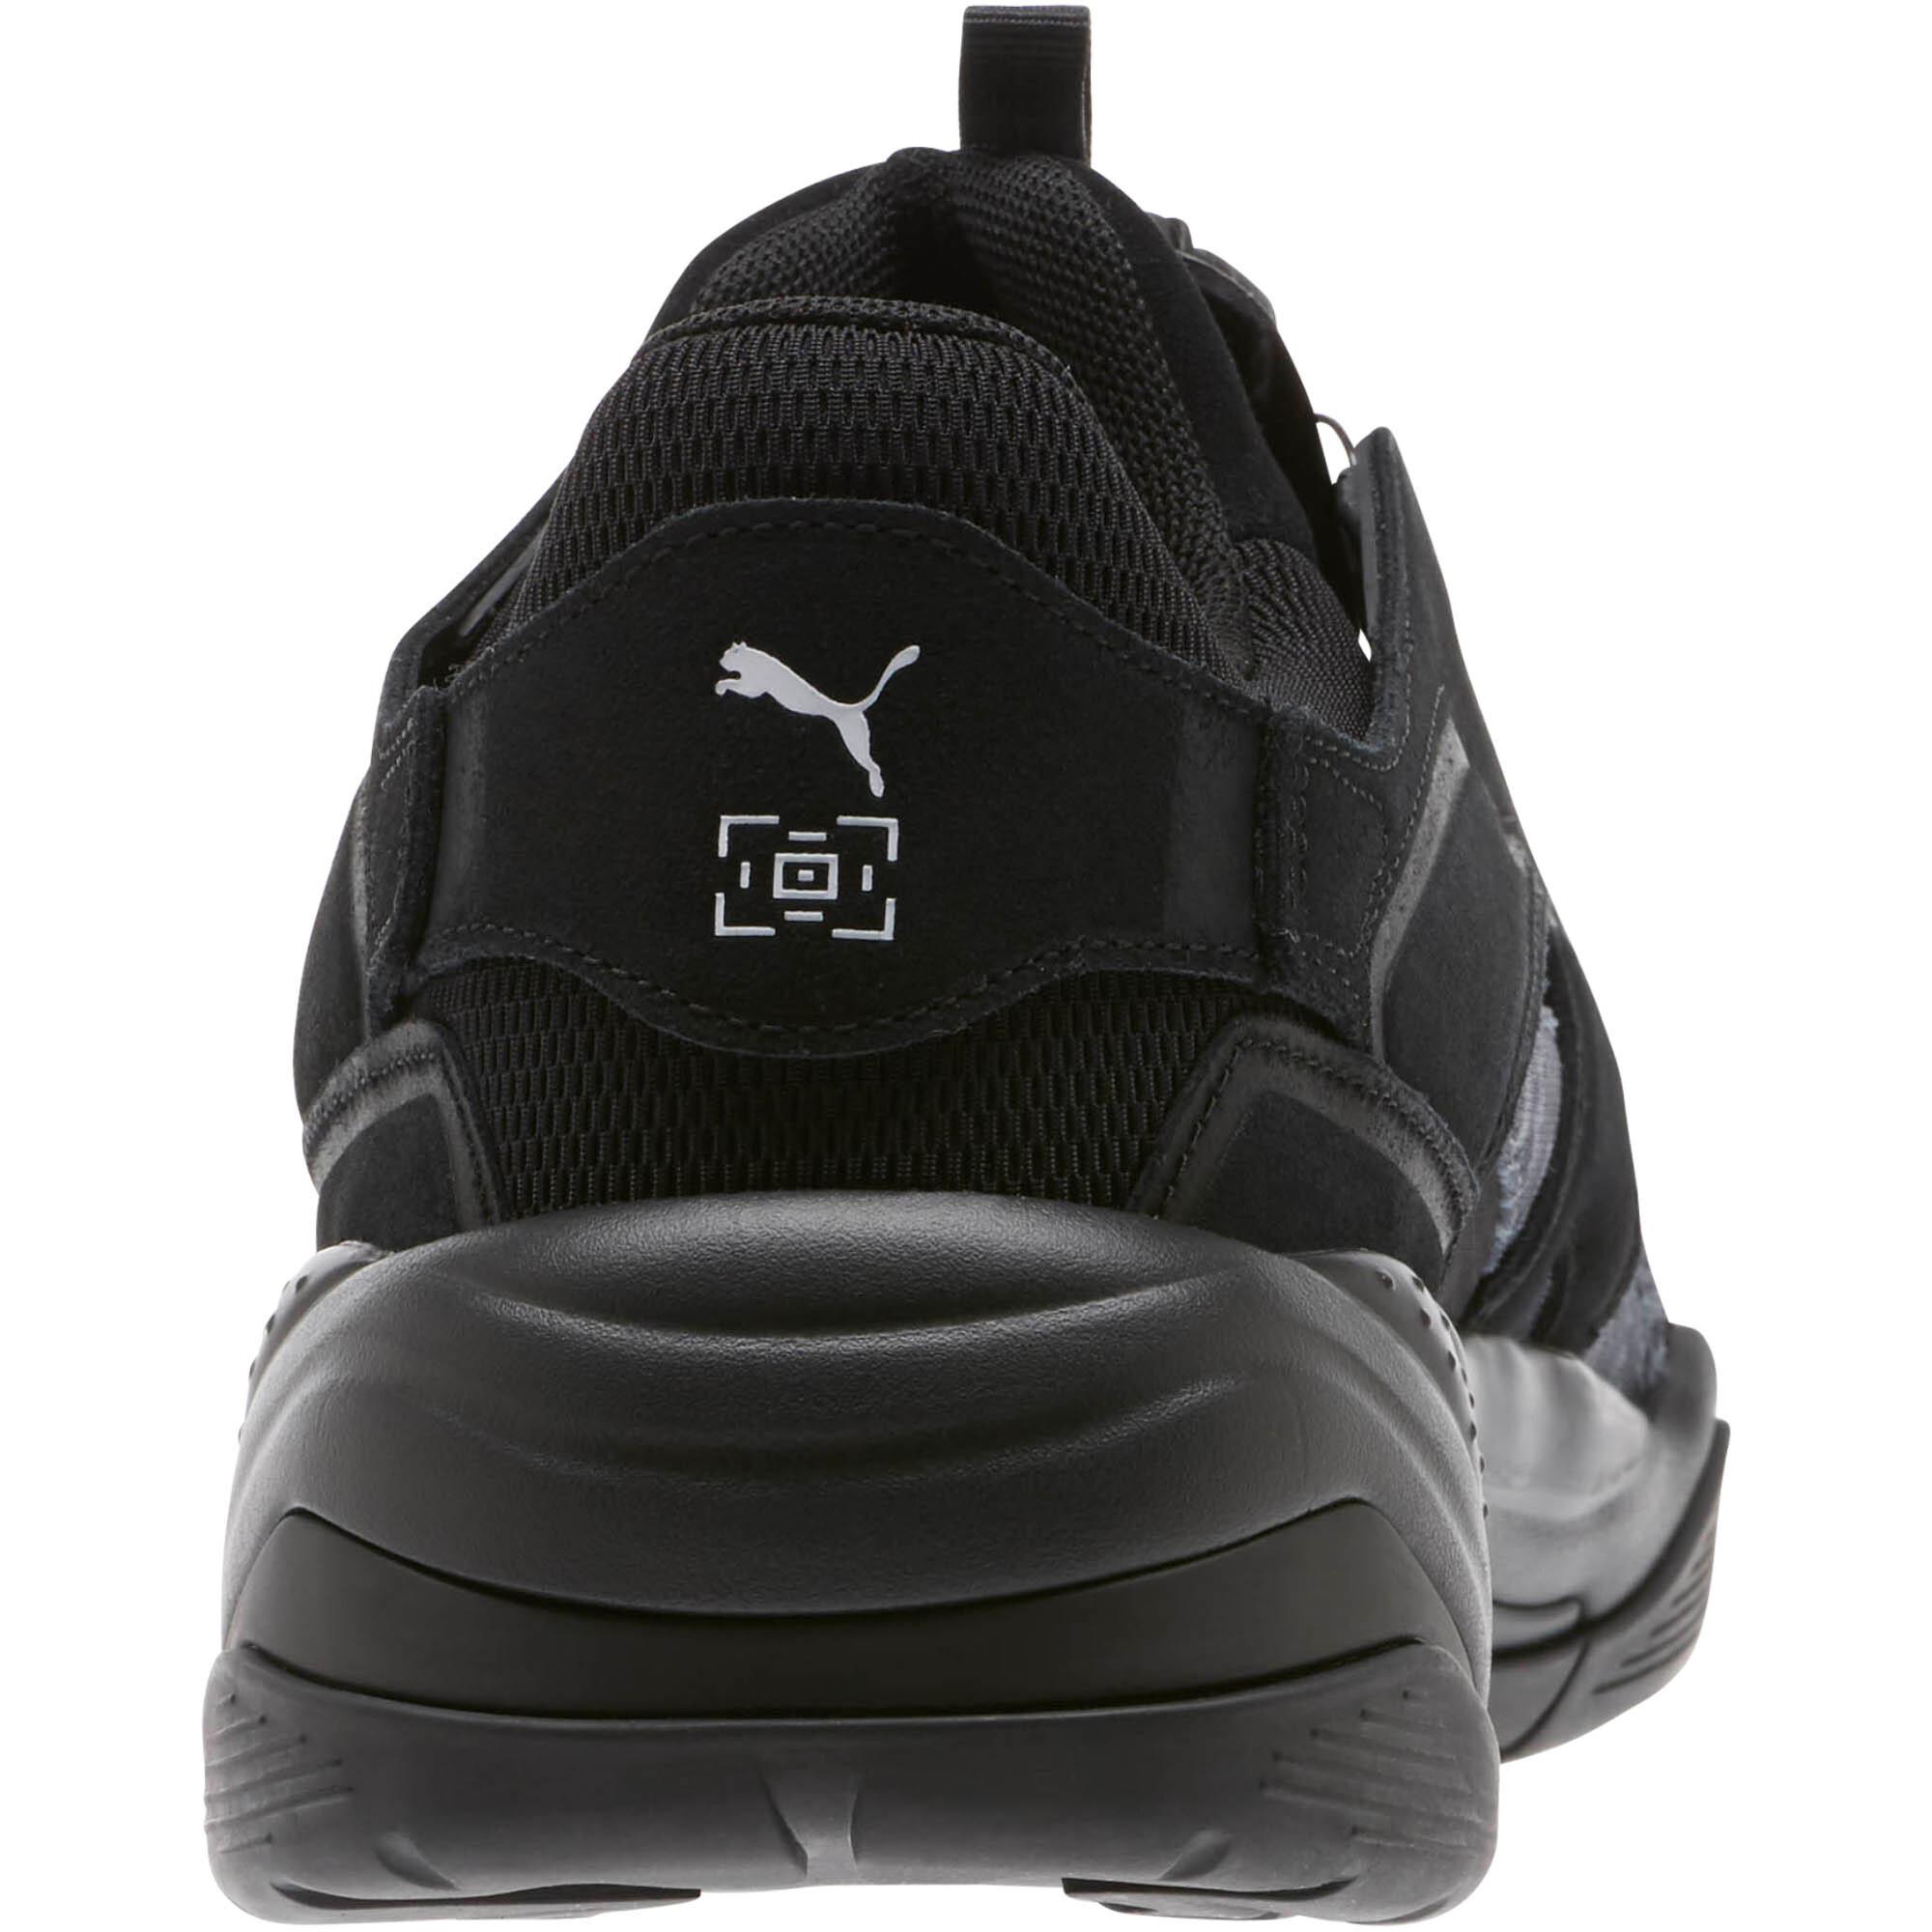 Image Puma PUMA X LES BENJAMINS Thunder Disc Sneakers #3